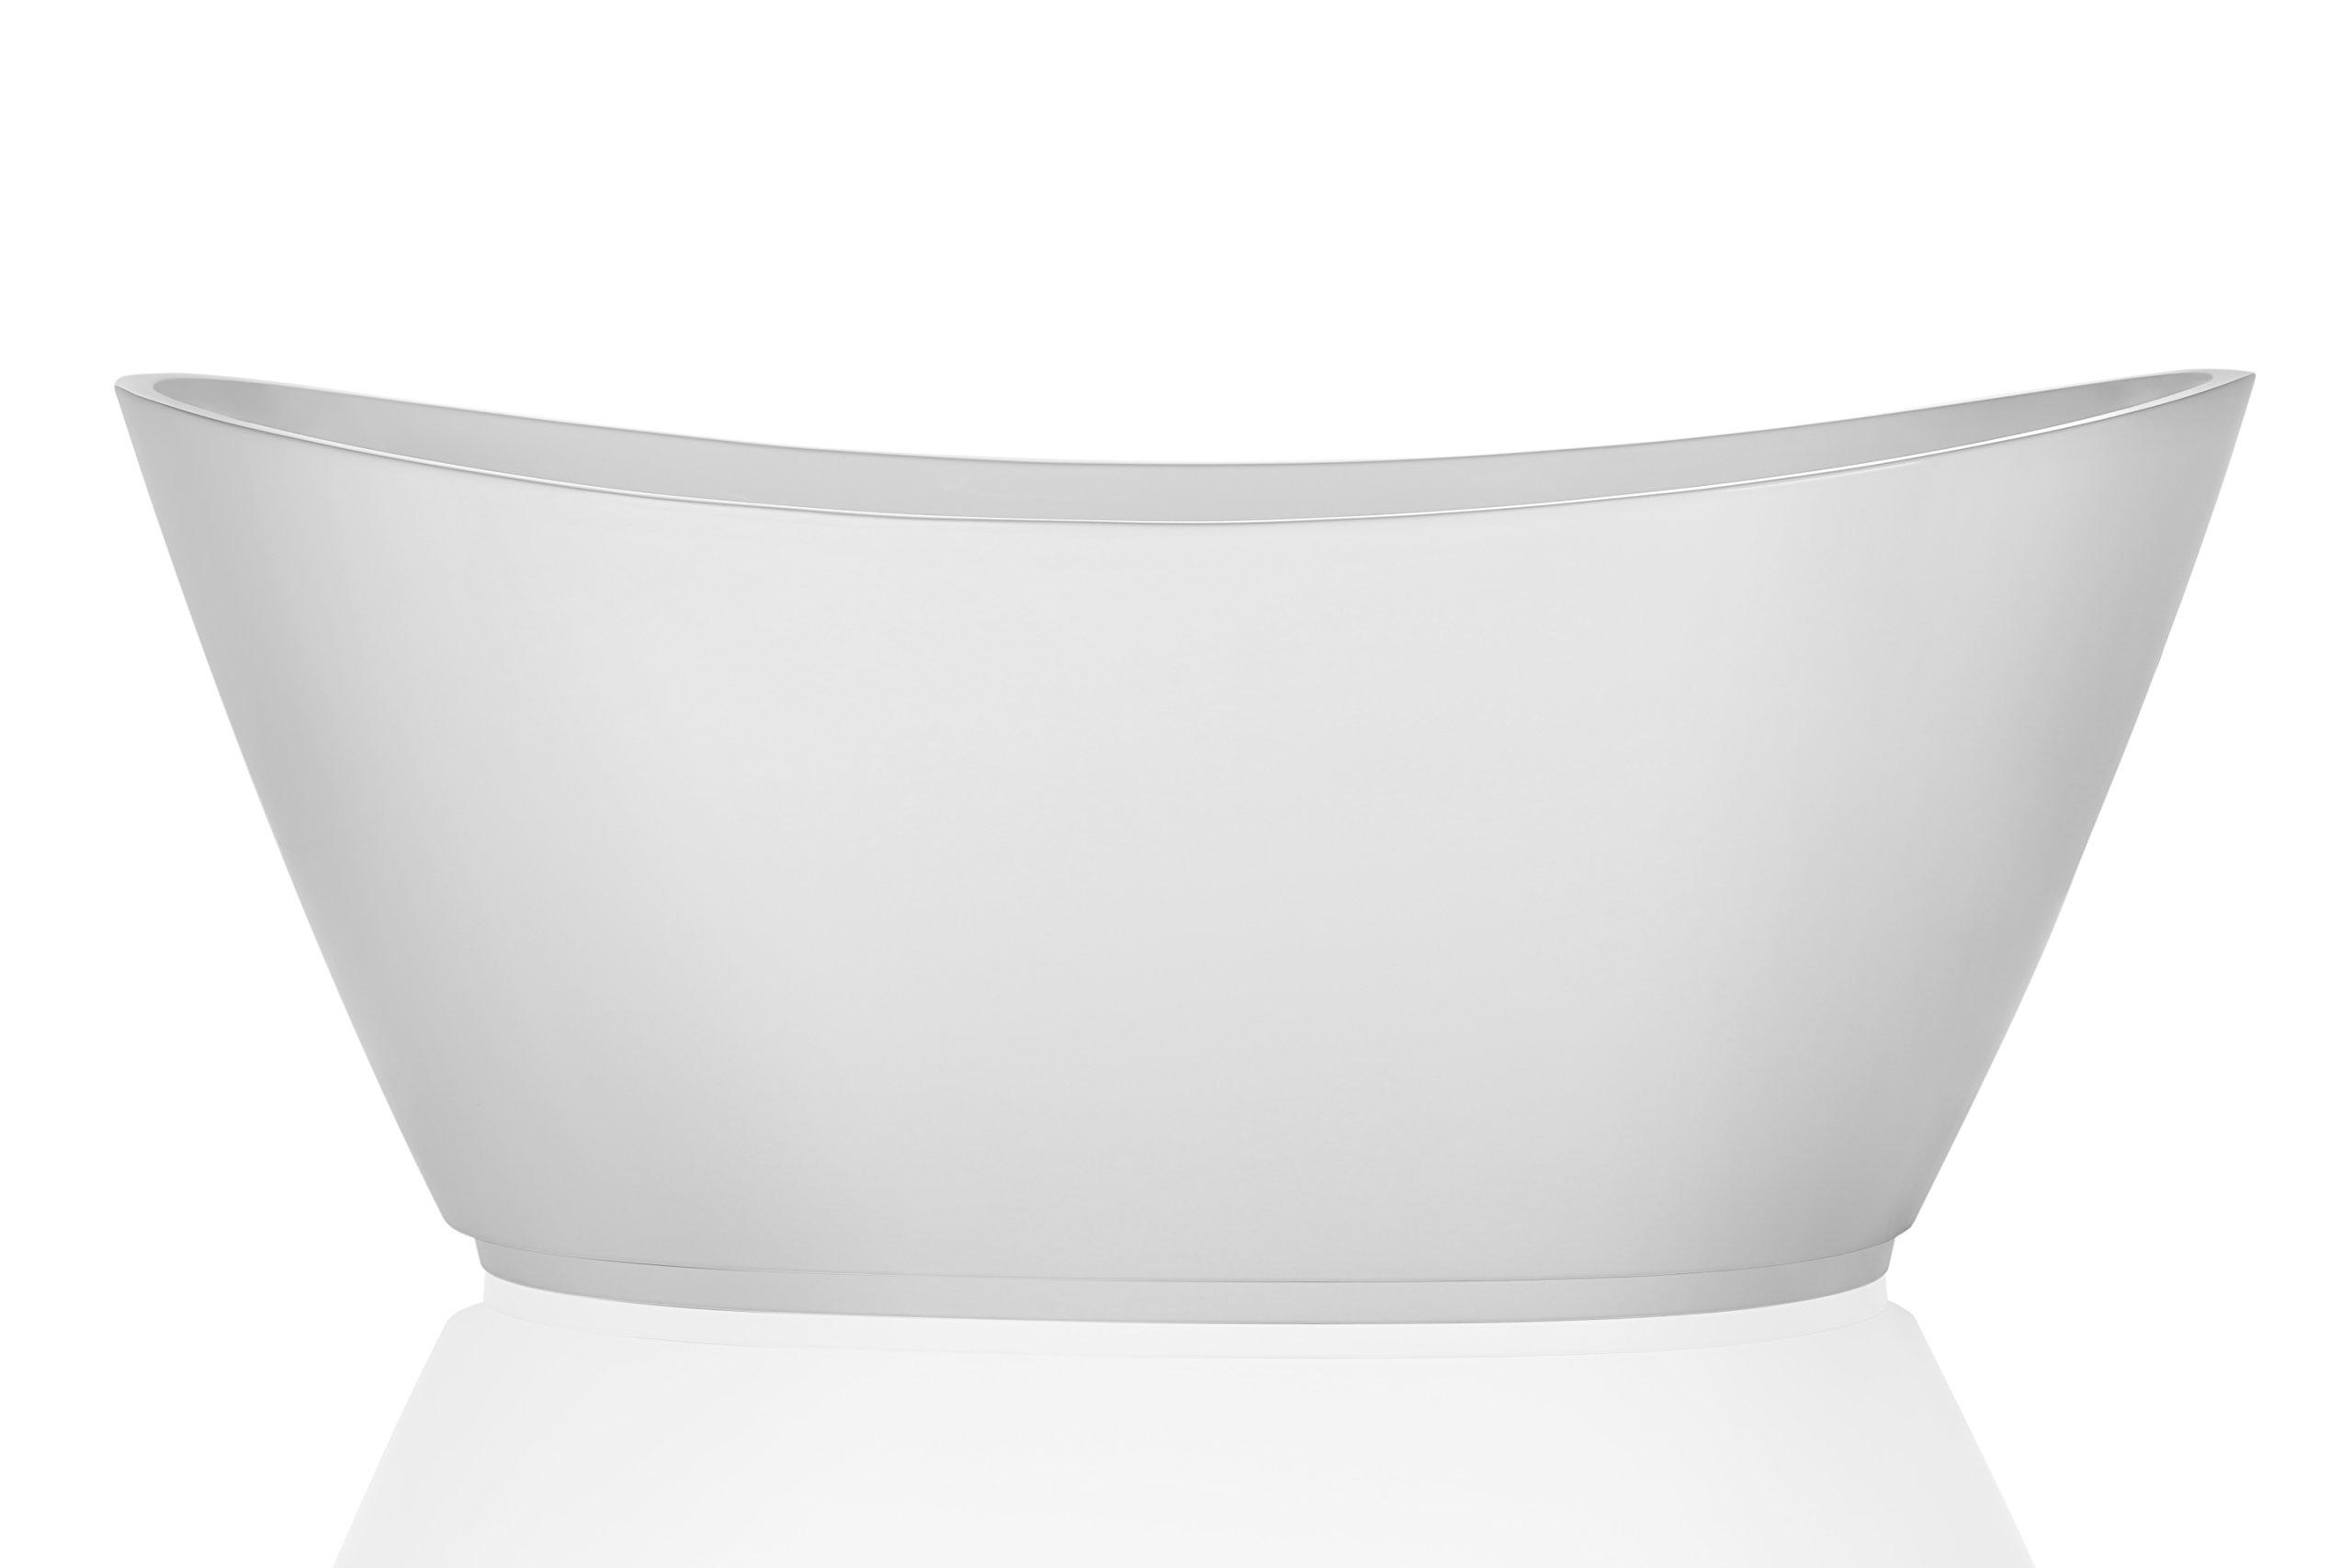 Empava 69'' Luxury Bathroom Series Acrylic Freestanding Bathtub Contemporary Soaking SPA Tub EMPV-FT1603